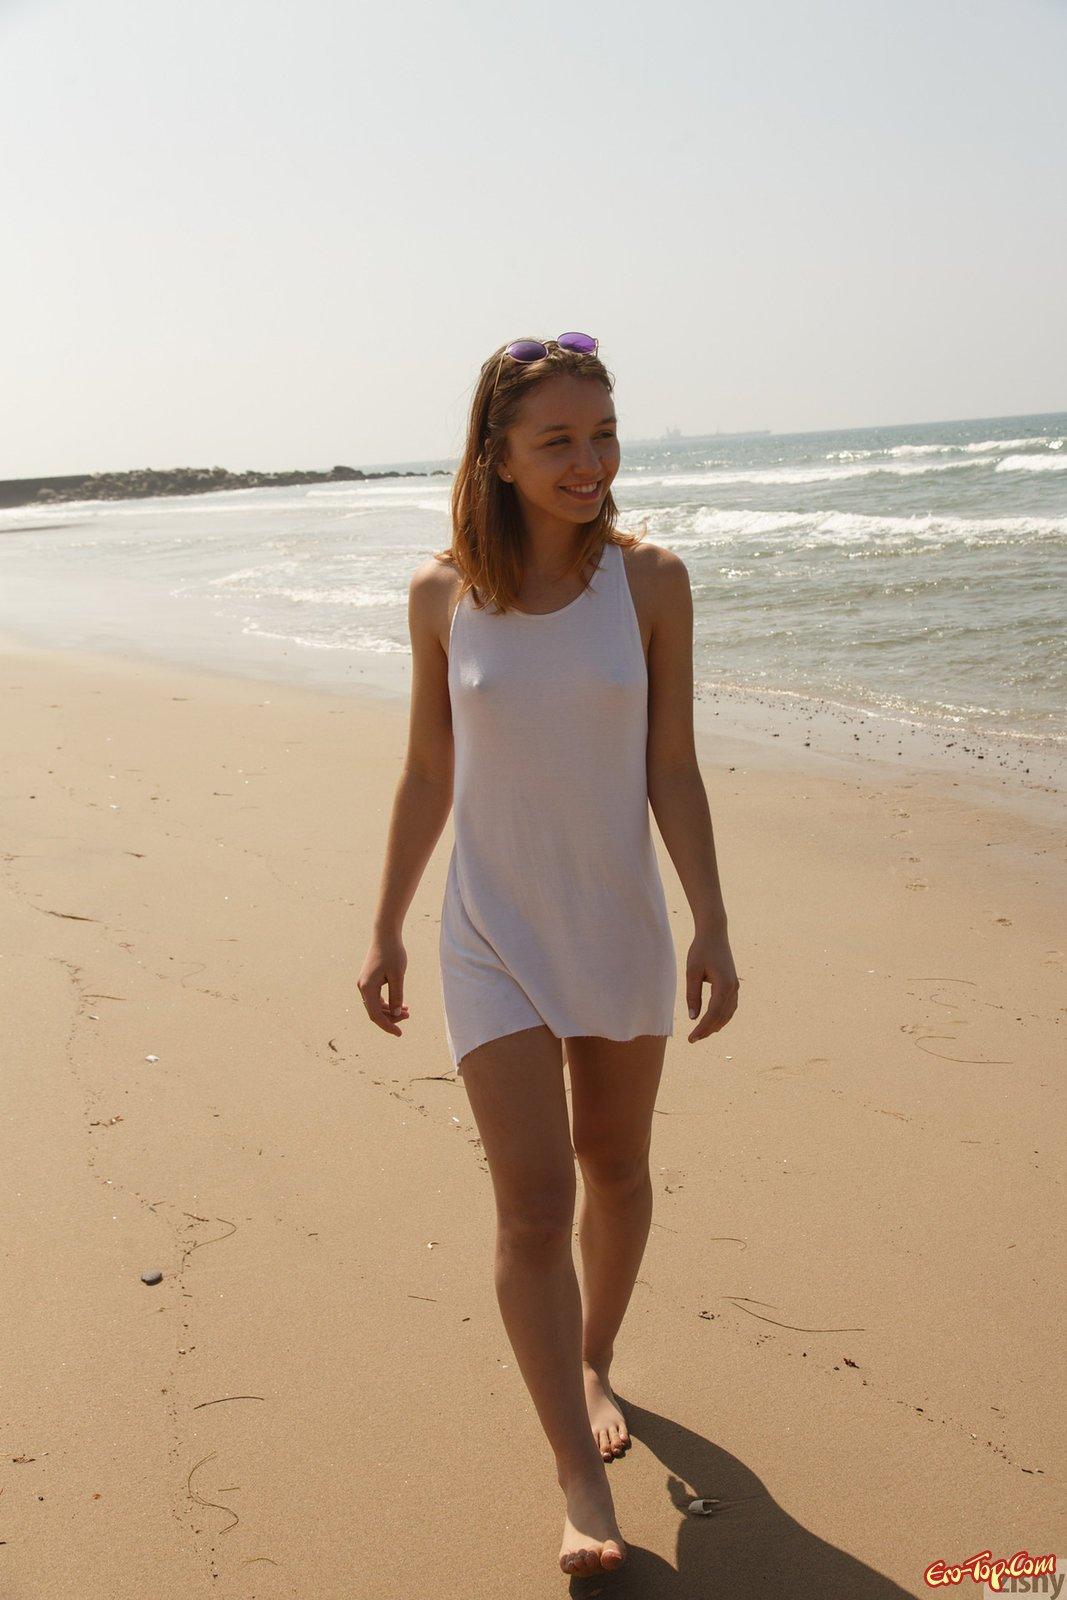 Woman без трусиков засветила титьки и пизду на песке